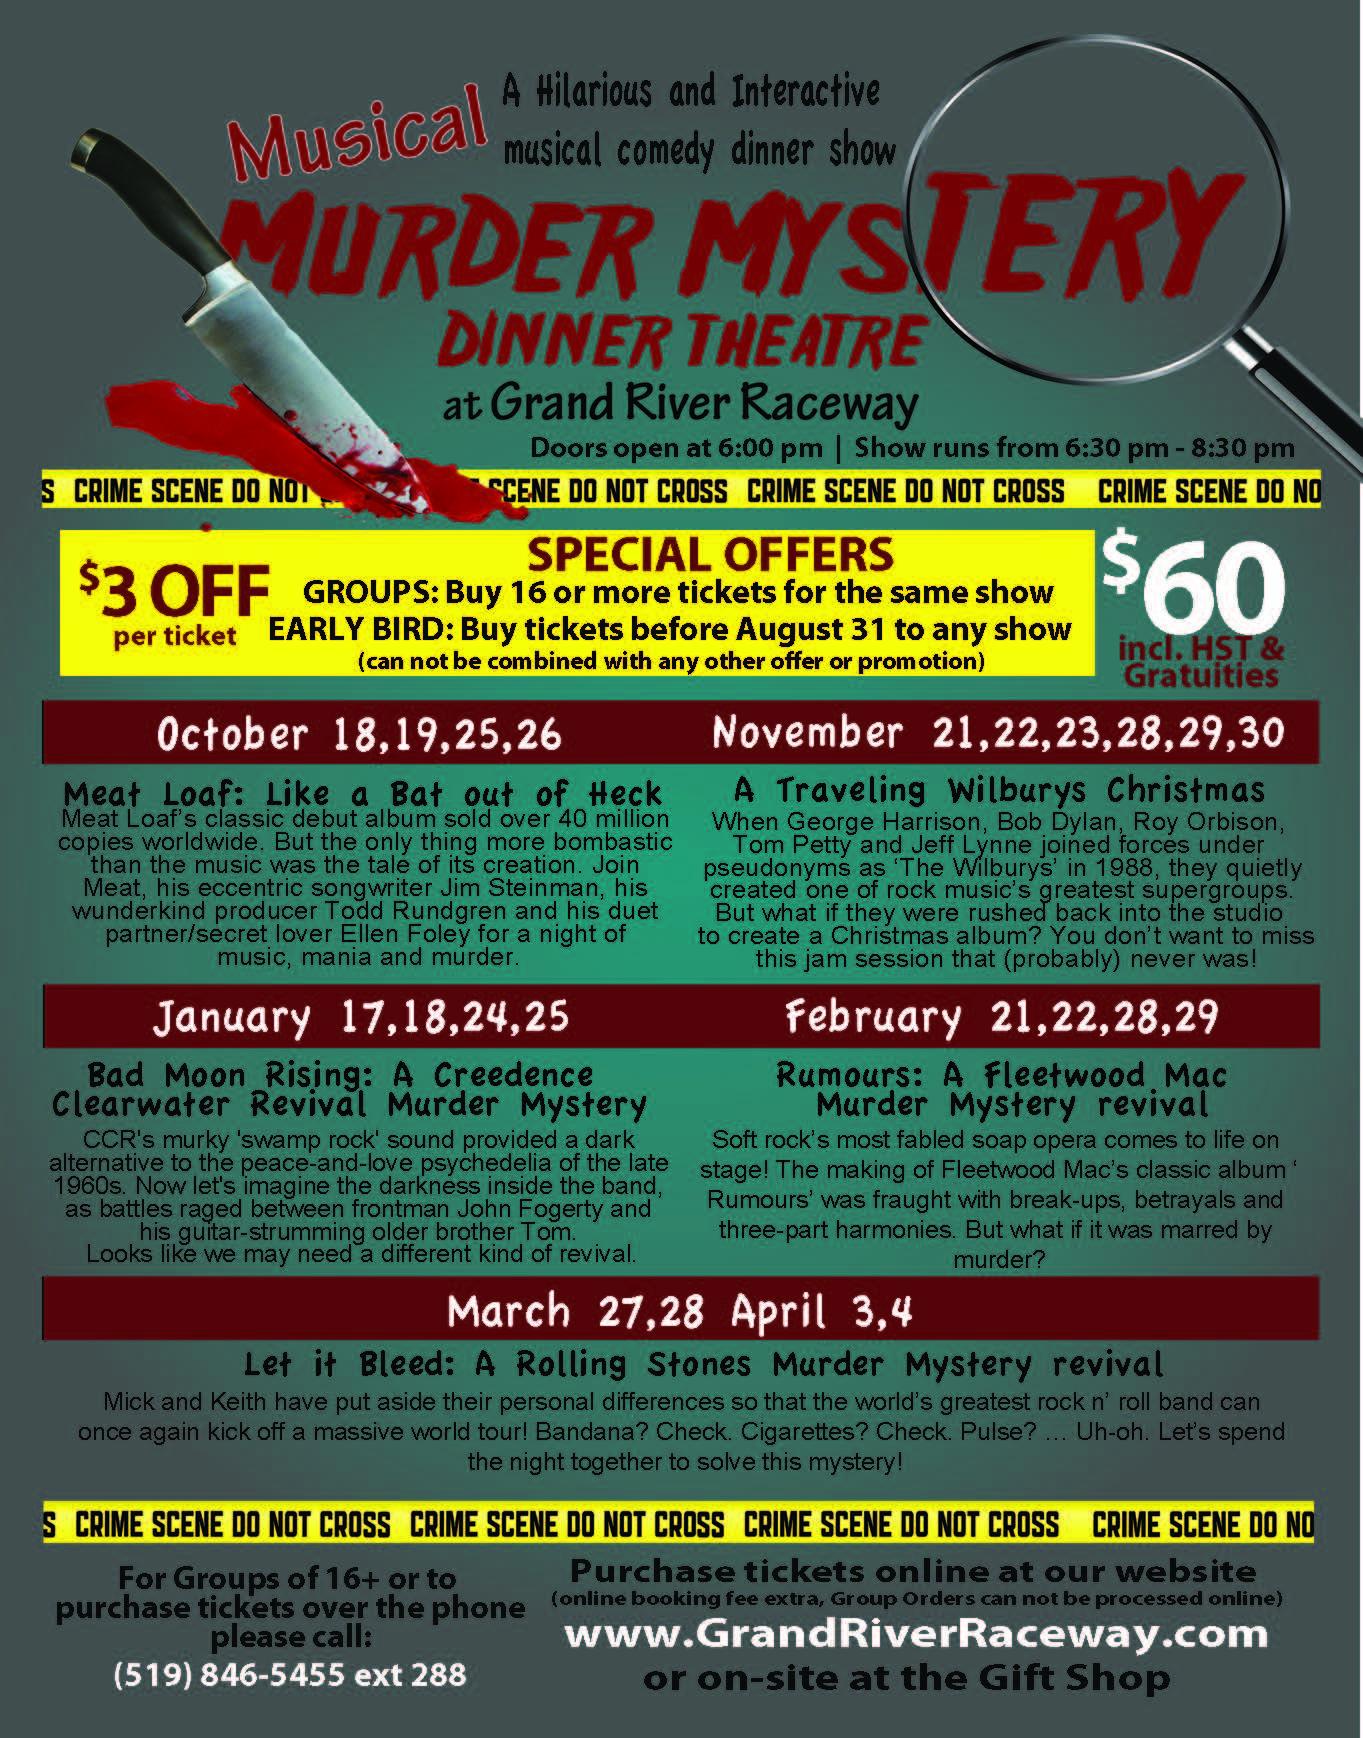 Murder Mystery Dinner Theatre – Grand River Raceway